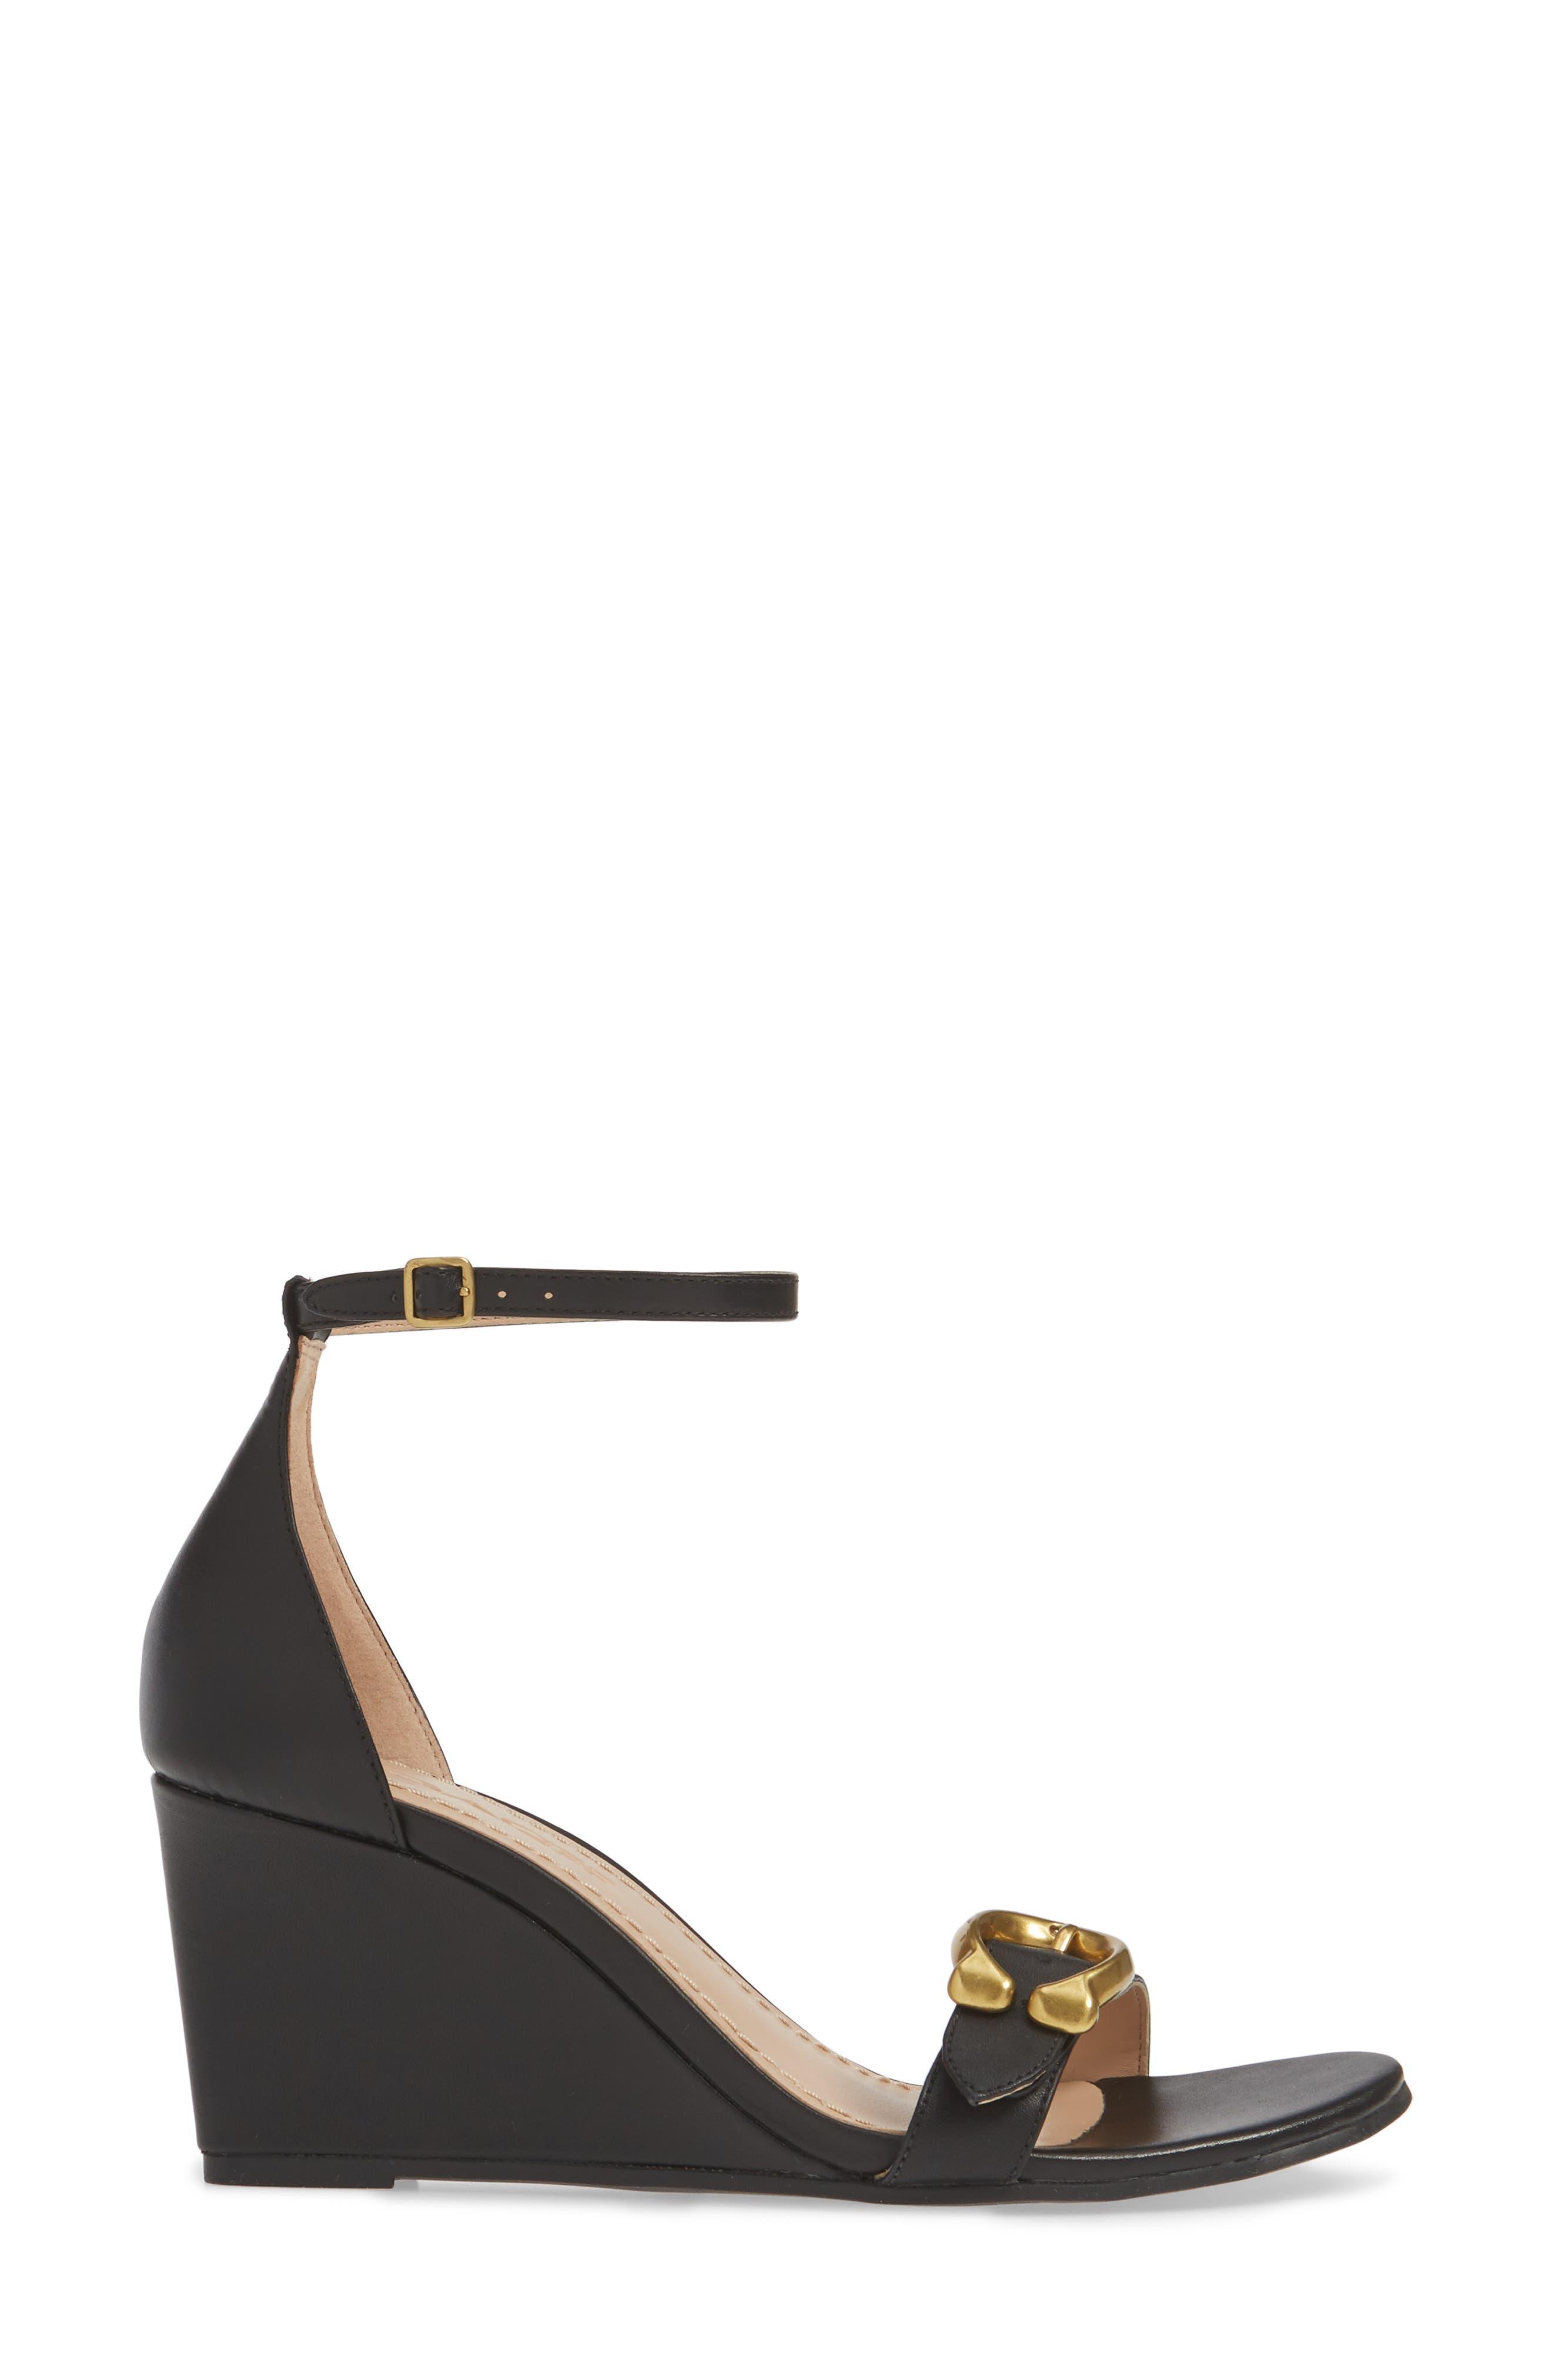 COACH, Odetta Wedge Ankle Strap Sandal, Alternate thumbnail 3, color, BLACK LEATHER